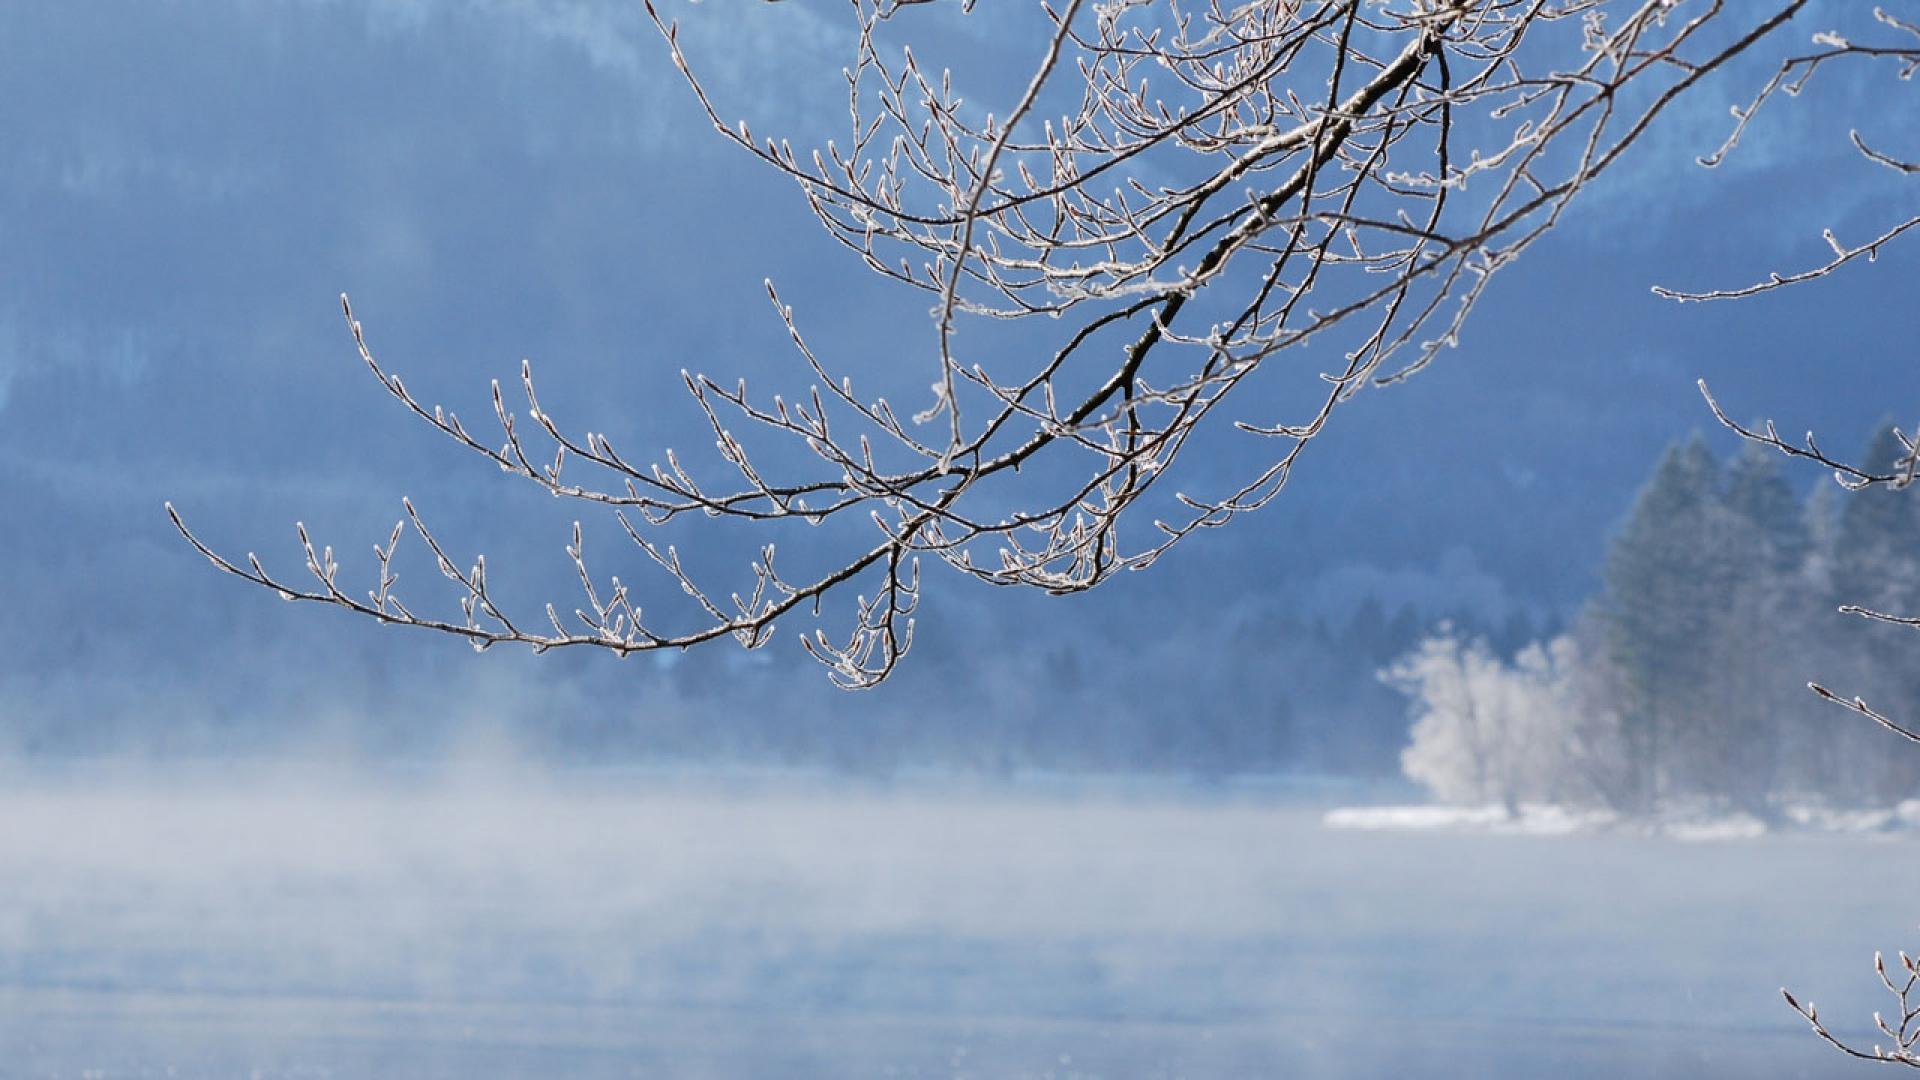 Download Wallpaper 1920x1080 branch, water, tree, winter ...